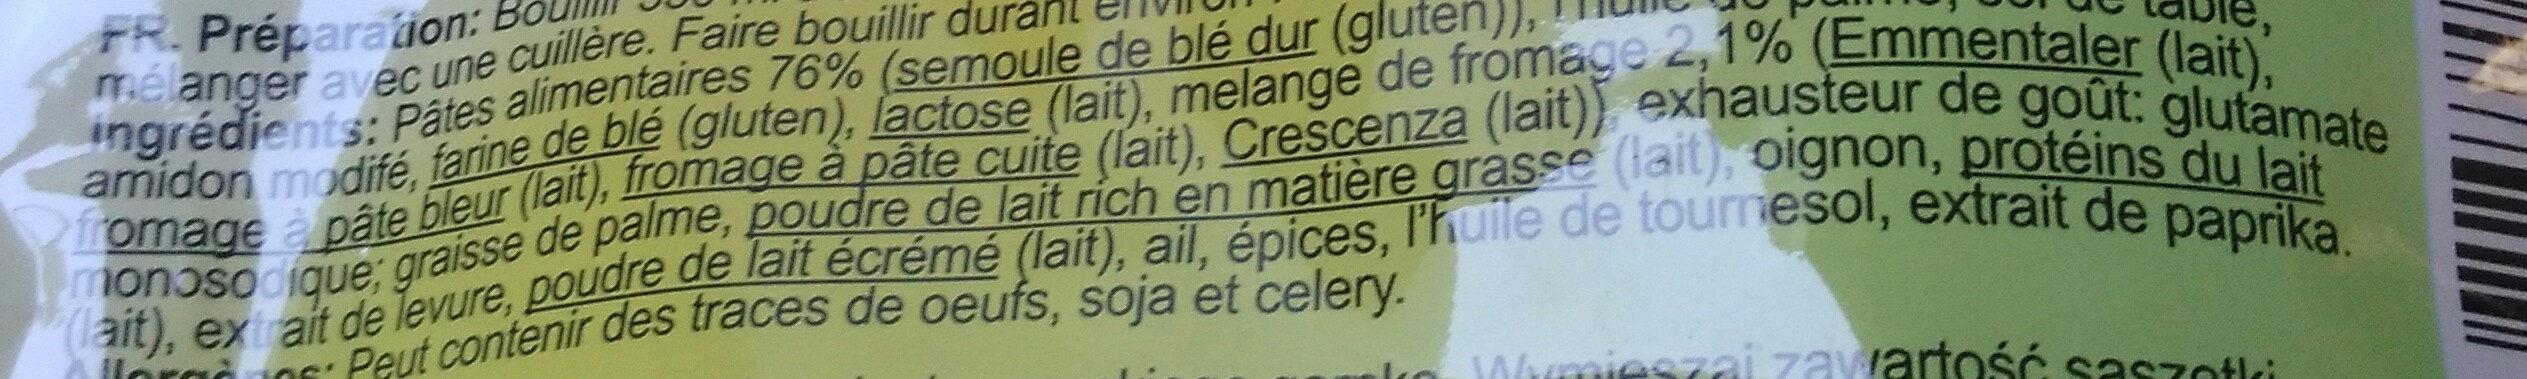 Culiquick - Ingredients - fr